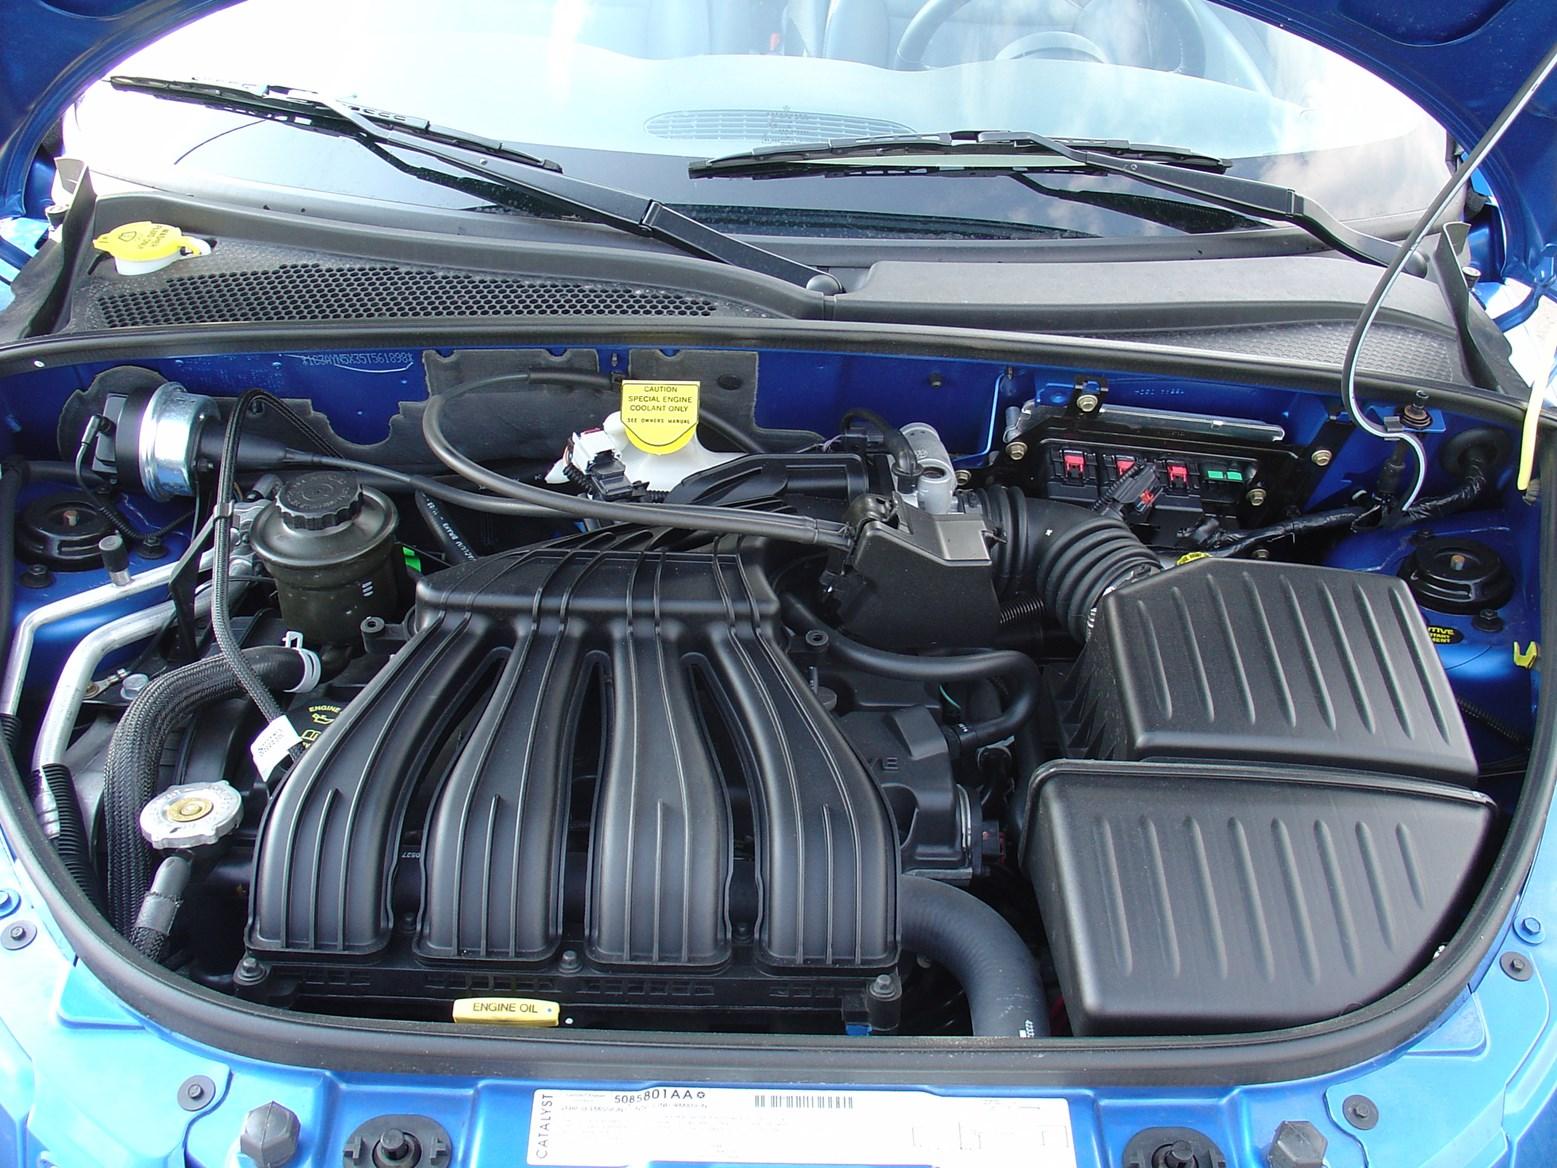 Used Chrysler PT Cruiser Cabriolet (2005 - 2008) Review ...